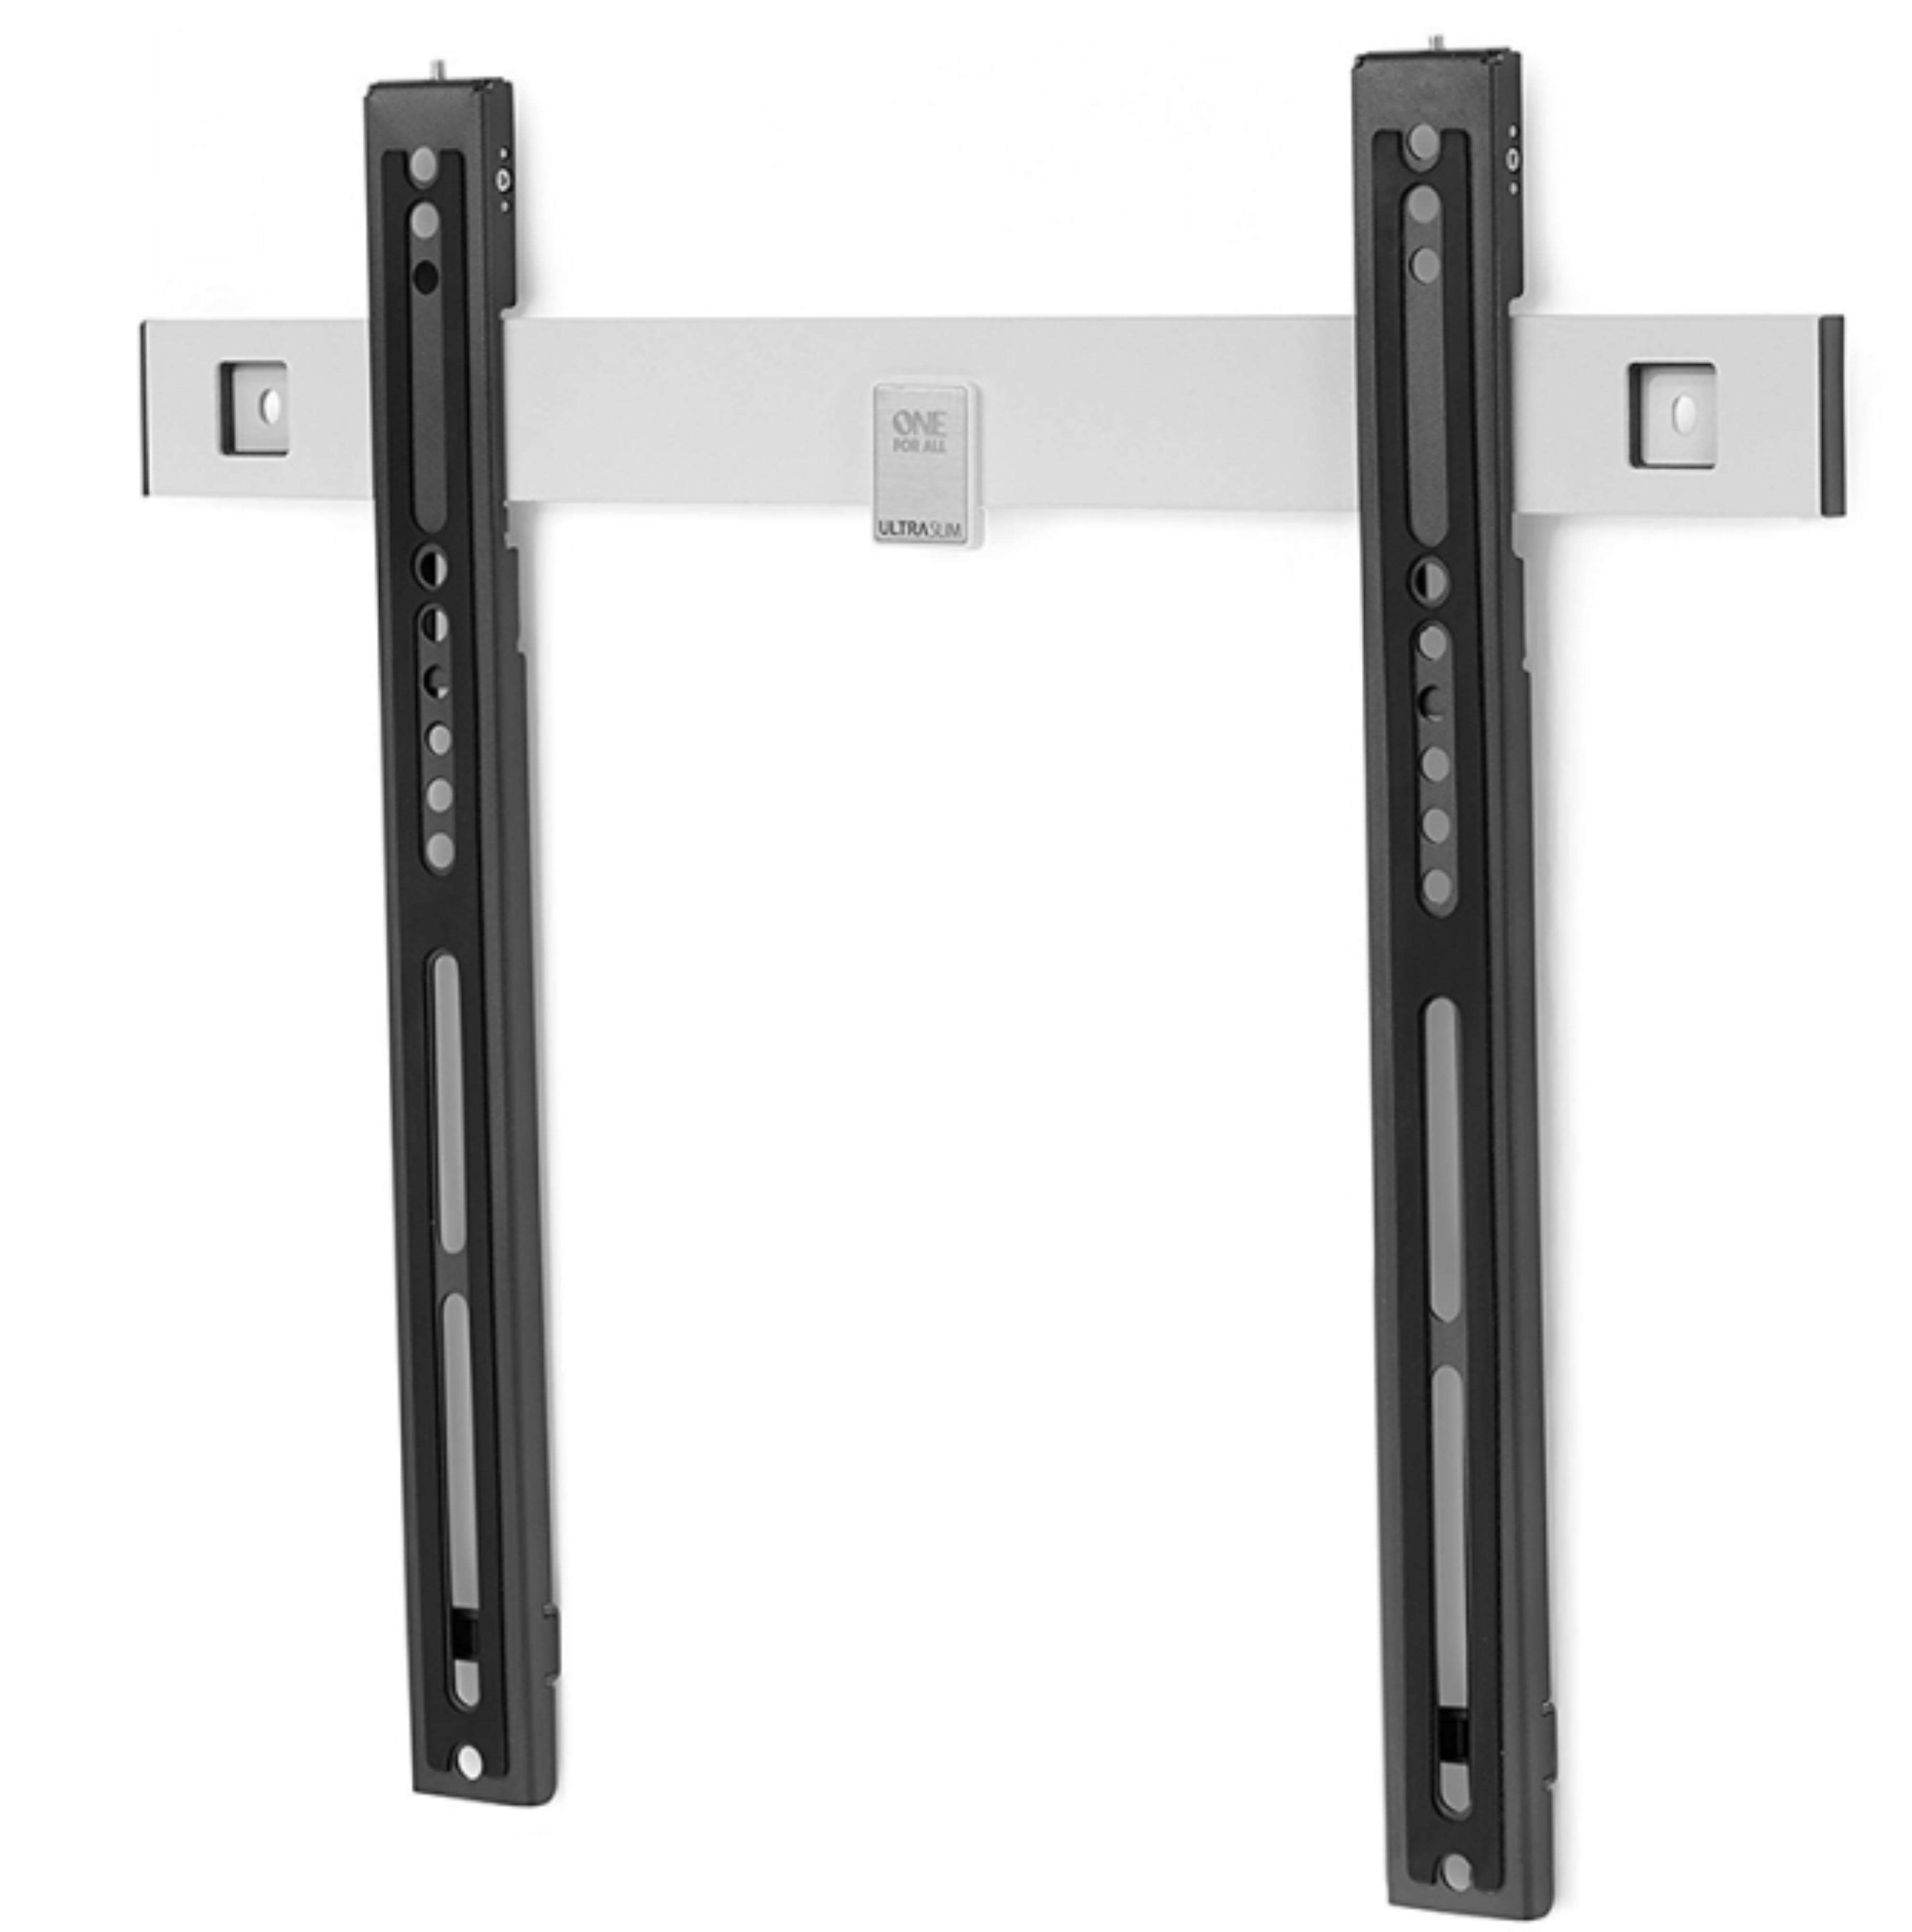 One For All WM6411 TV Bracket|Flat|Ultra Slim Series|32-60 inch|Auto Lock|New|